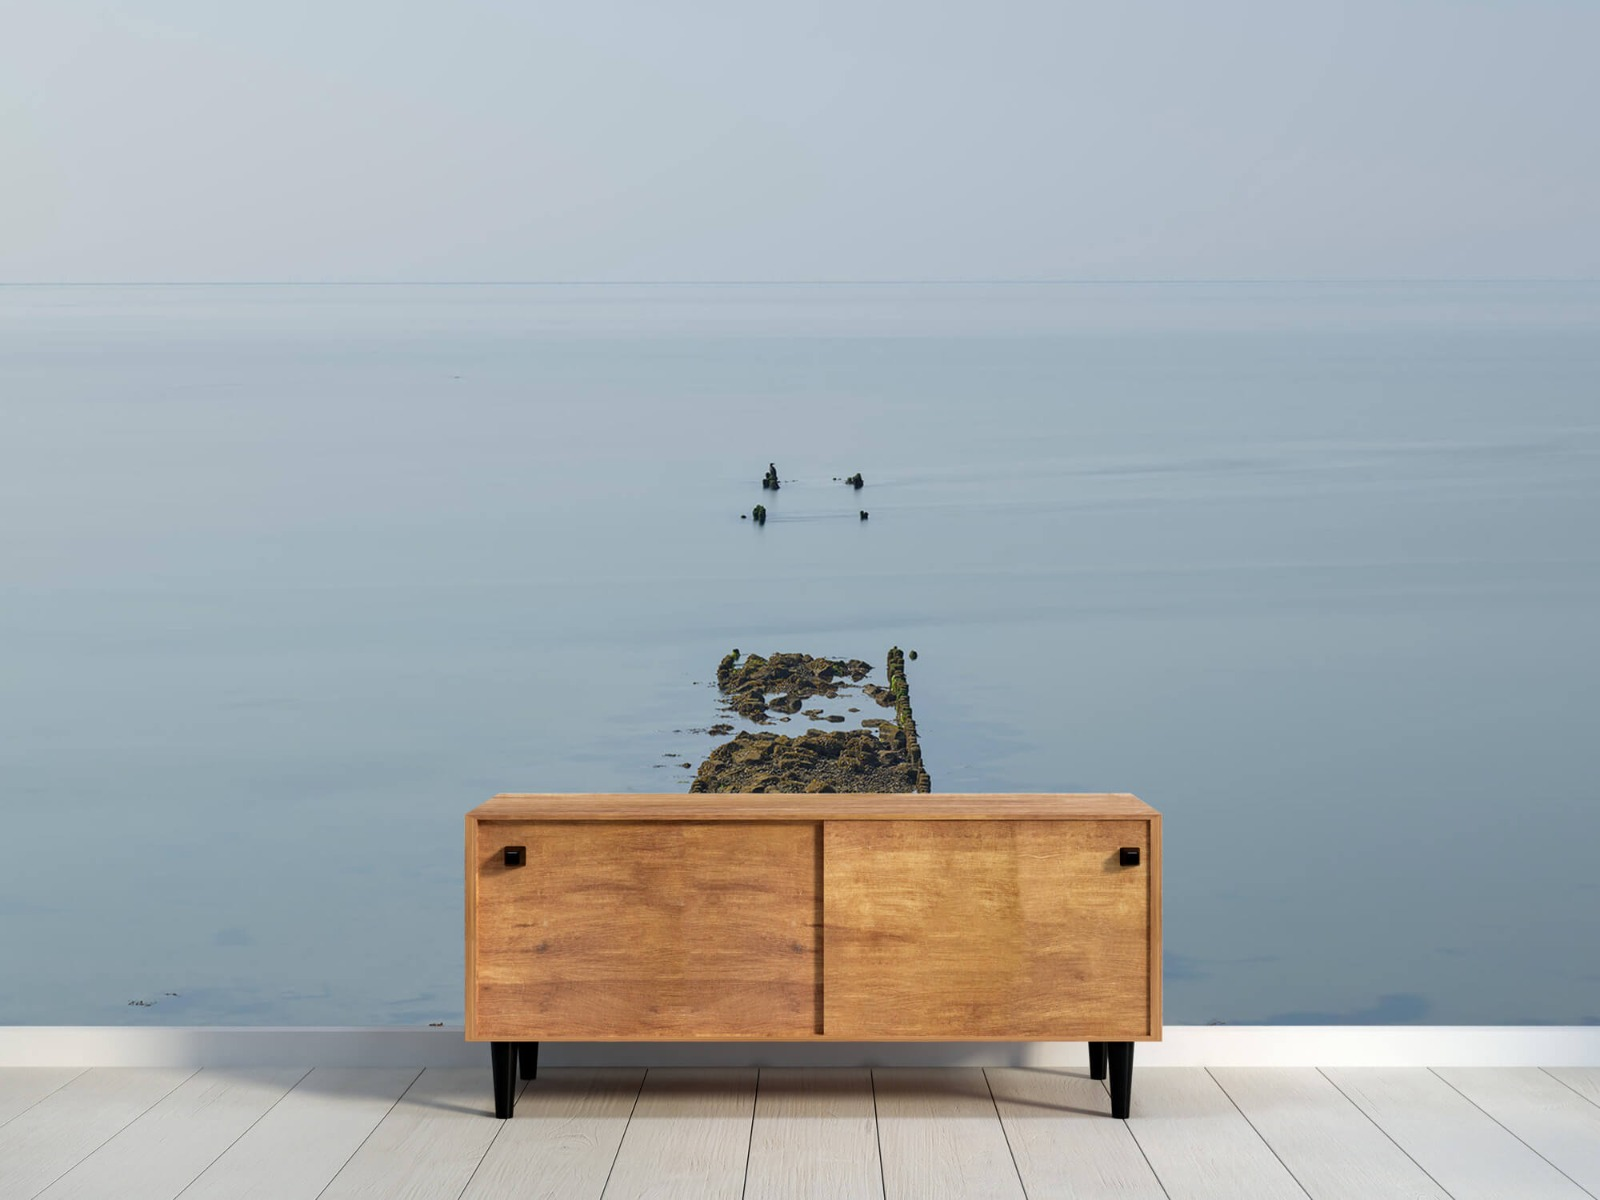 Zeeën en Oceanen - Golfbreker - Slaapkamer 9